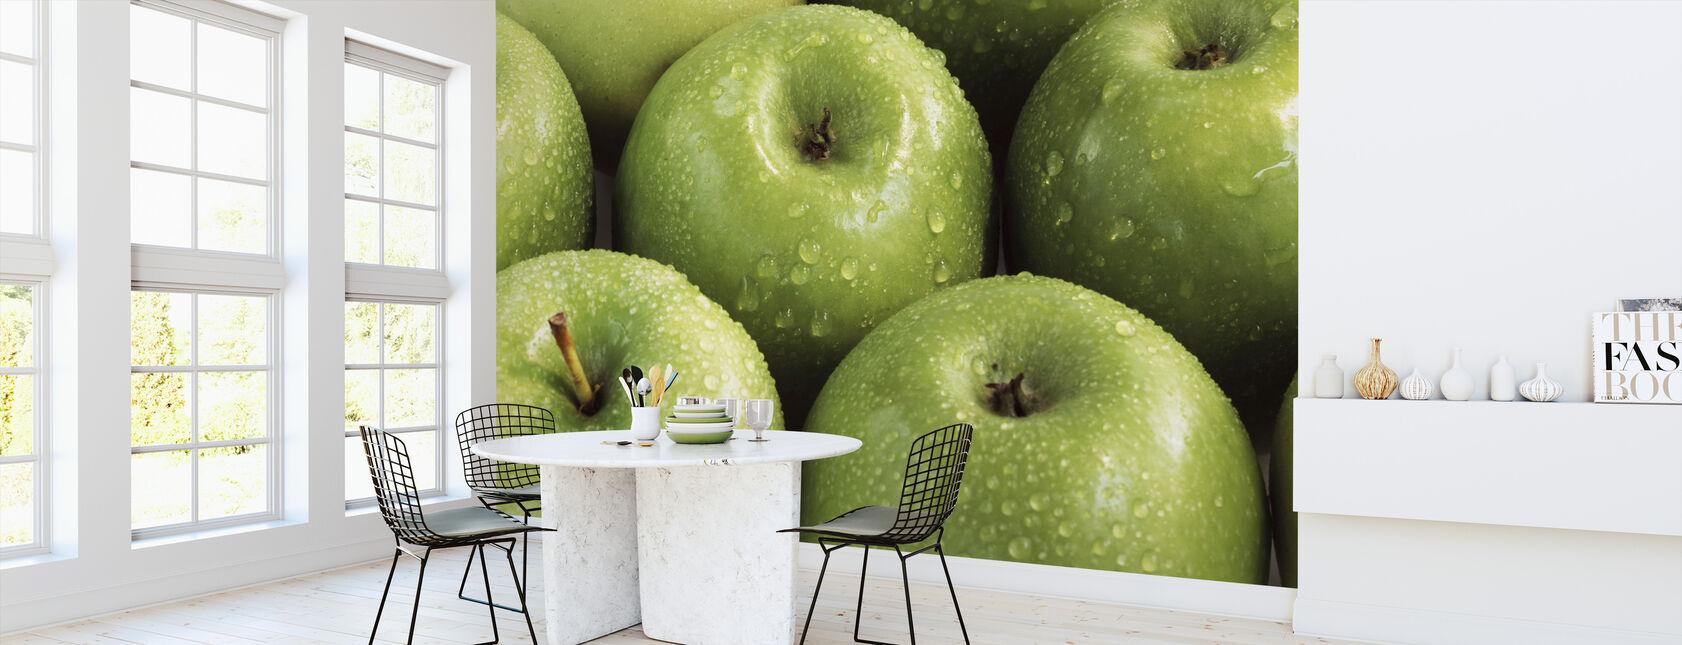 Apples - Wallpaper - Kitchen